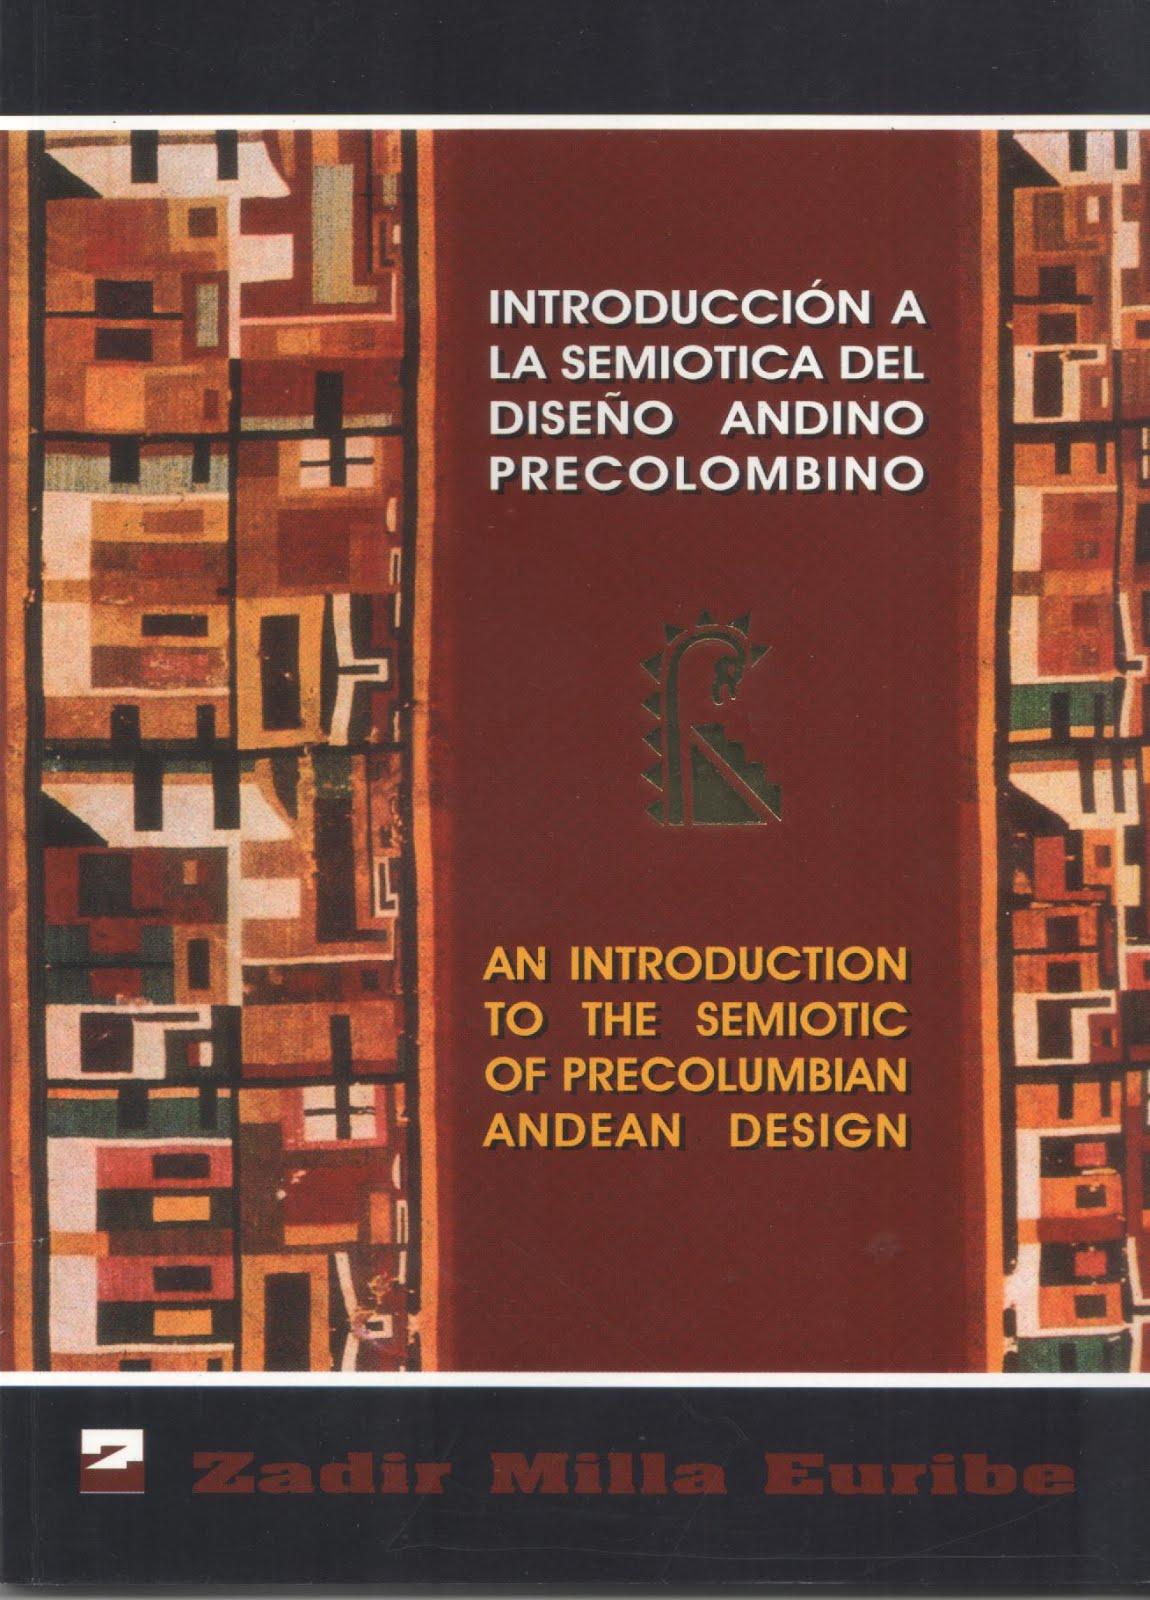 Introducciòn a la semiòtica andina del diseño andino precolombino